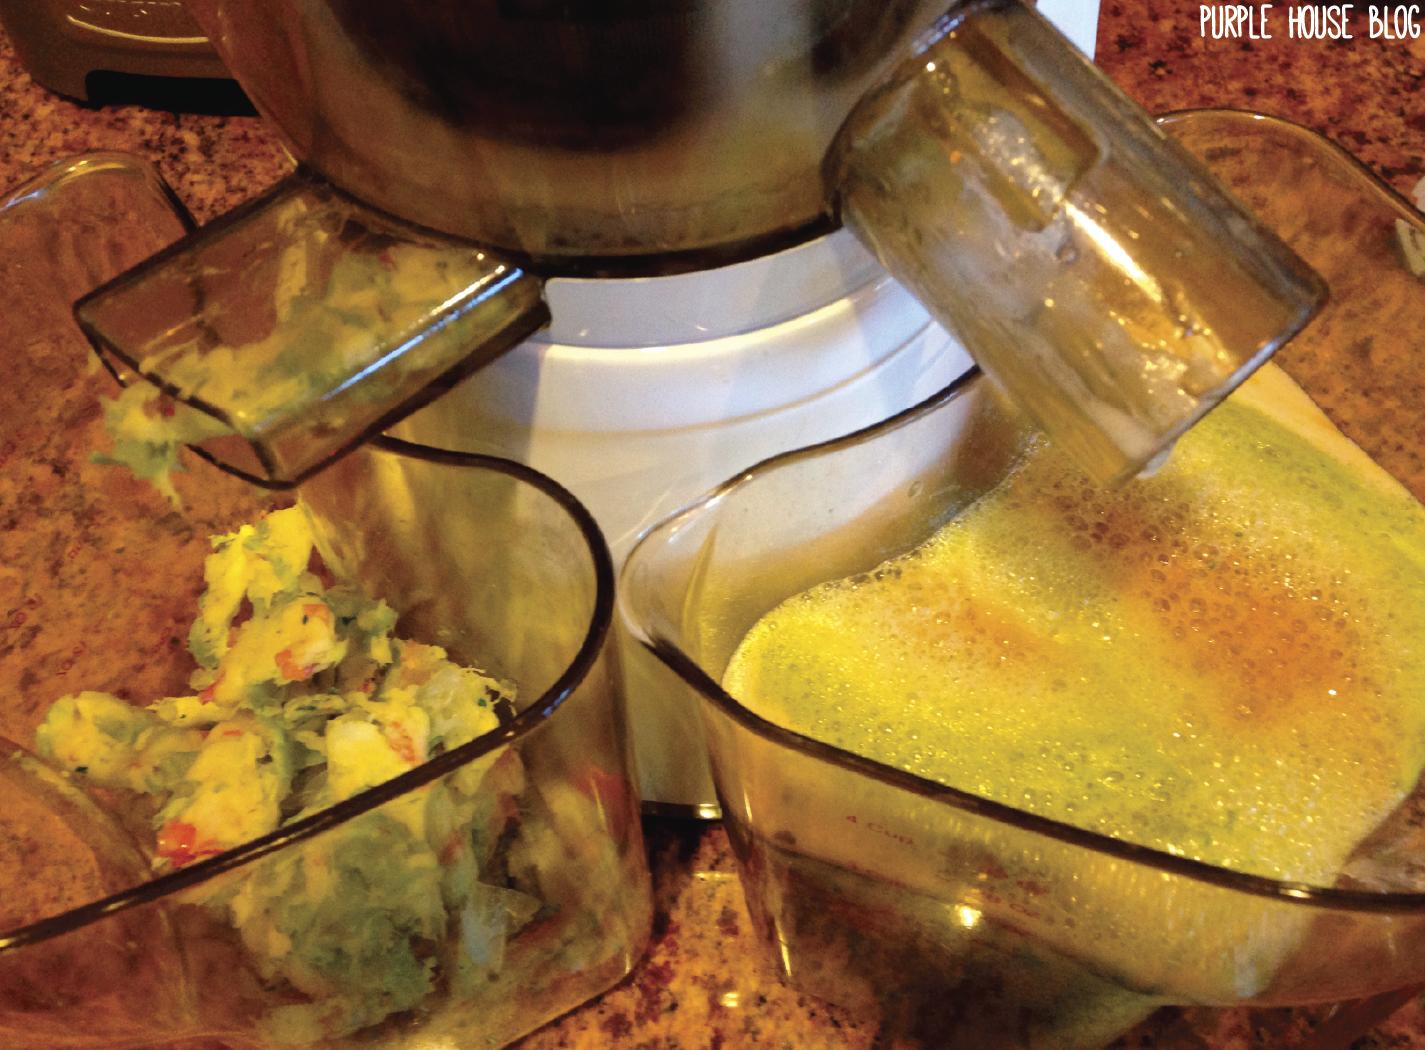 Slow Juicer Lemonade : Green Strawberry Lemonade Purple House Blog